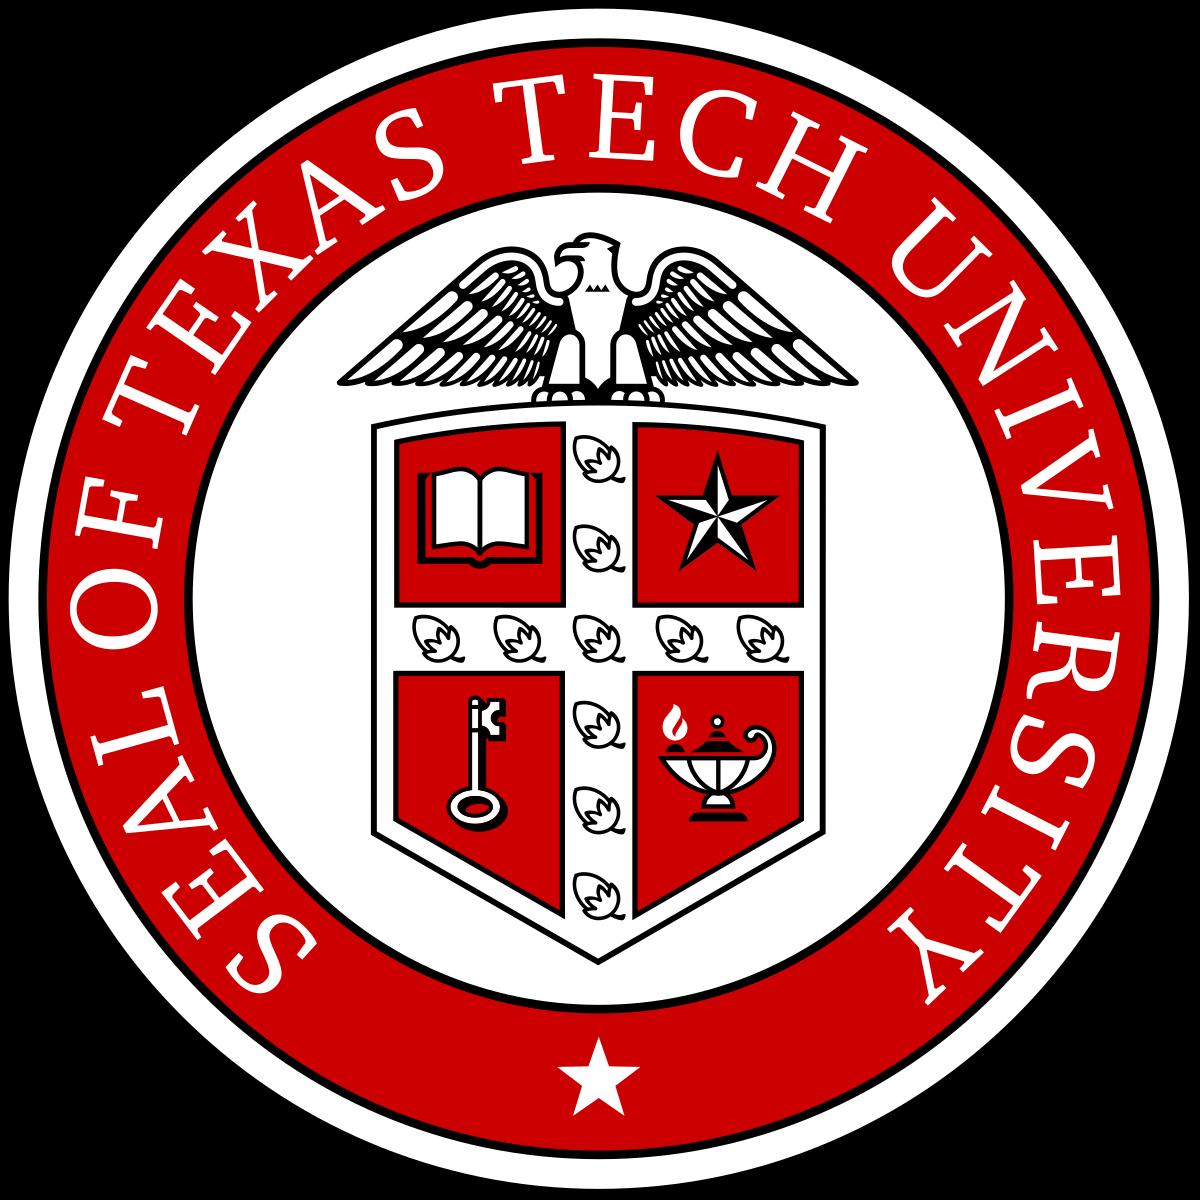 1200x1200 Texas Tech University